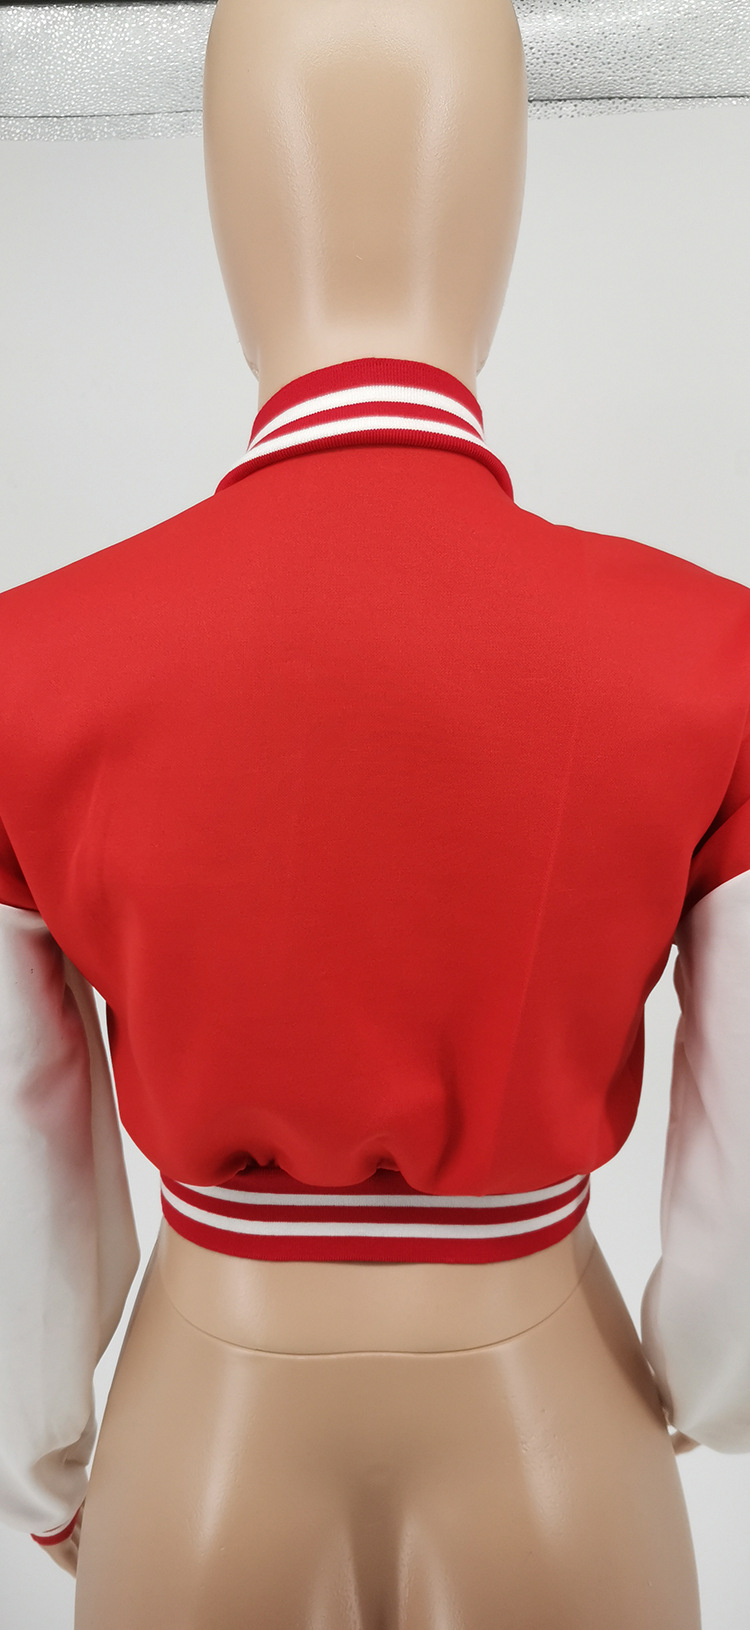 H0b503d0ed546431f8afb788b425fcf7eT Baseball Jackets for Women 2021 Autumn Letter Print Color Patchwork Cropped Long Sleeve Loose Short Bomber Jacket